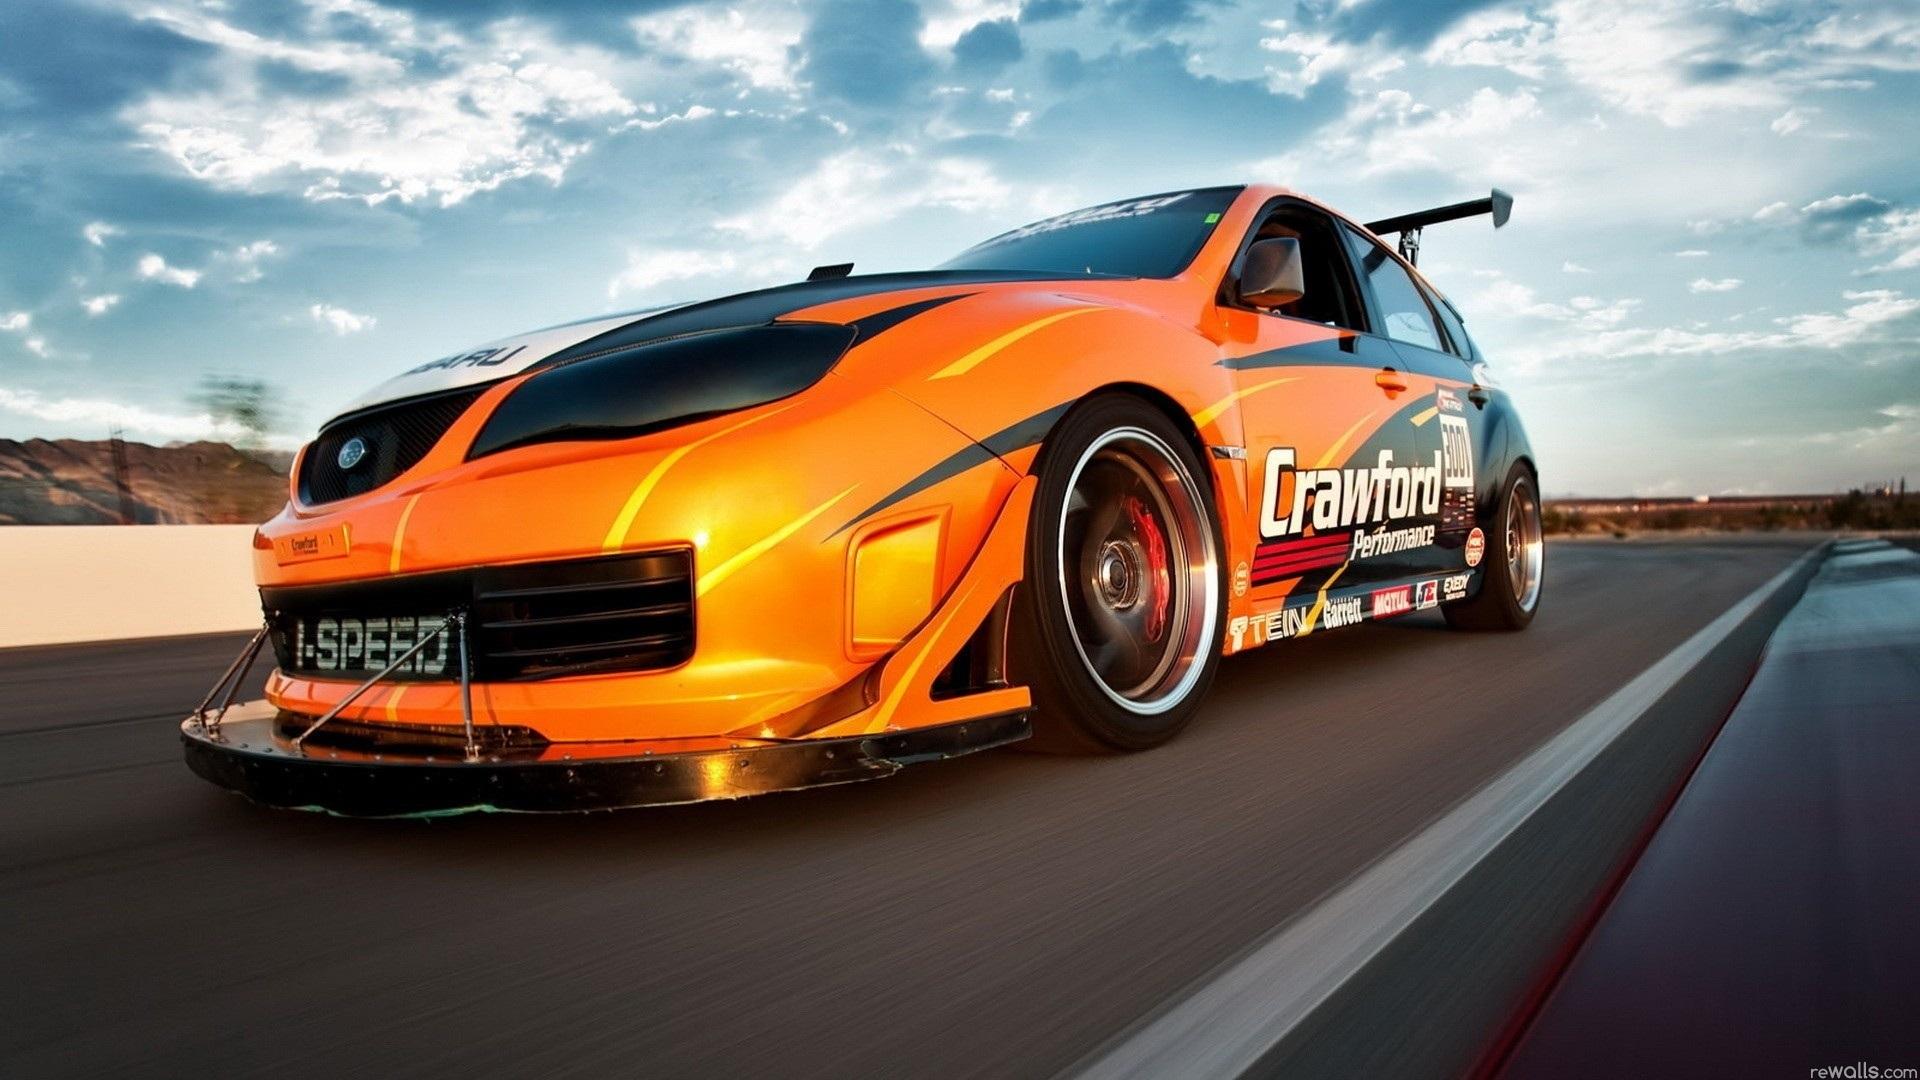 16 Luxury Pubg Wallpaper Iphone 6: 壁纸 橙色高速赛车 1920x1080 Full HD 2K 高清壁纸, 图片, 照片